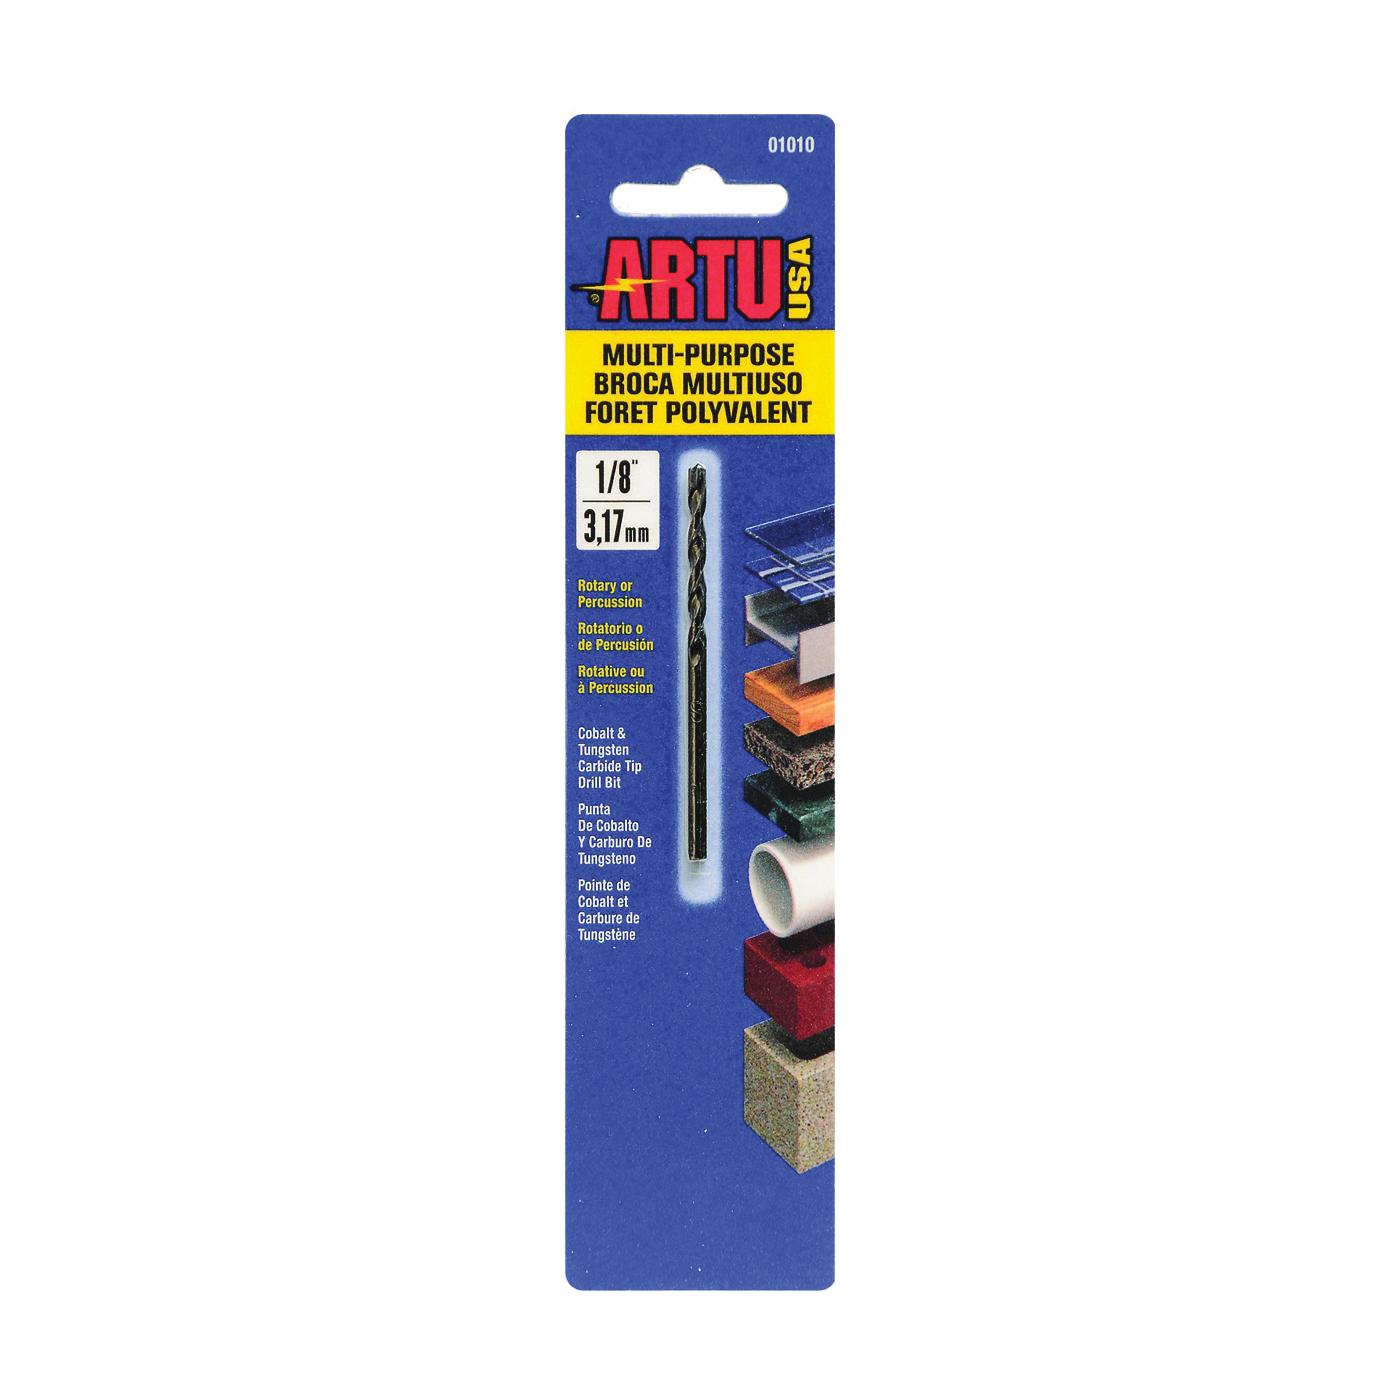 Picture of ARTU 01010 Drill Bit, 1/8 in Dia, 2-5/8 in OAL, Jobber Bit, Parabolic Flute, 1/8 in Dia Shank, Straight Shank